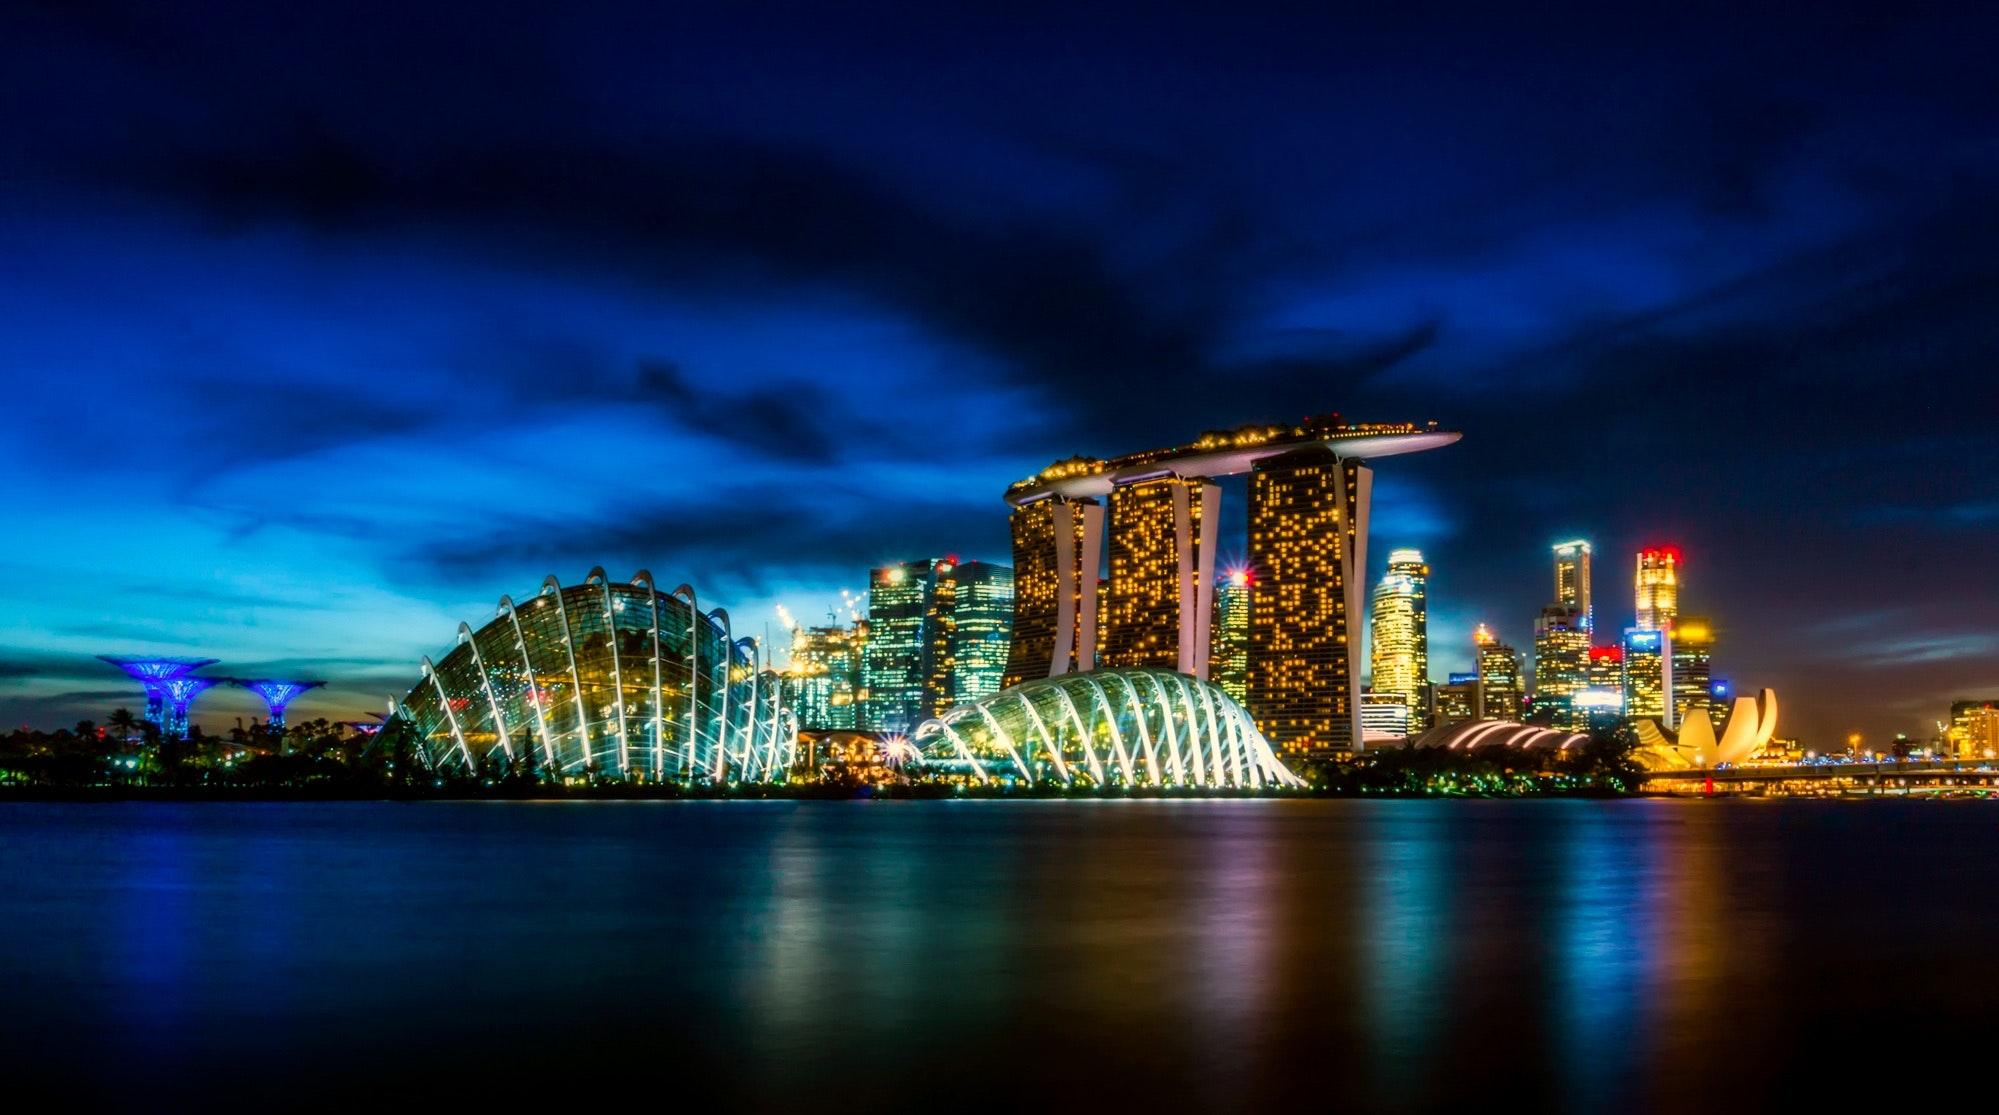 flights to Australia - Top layover destinations Singapore